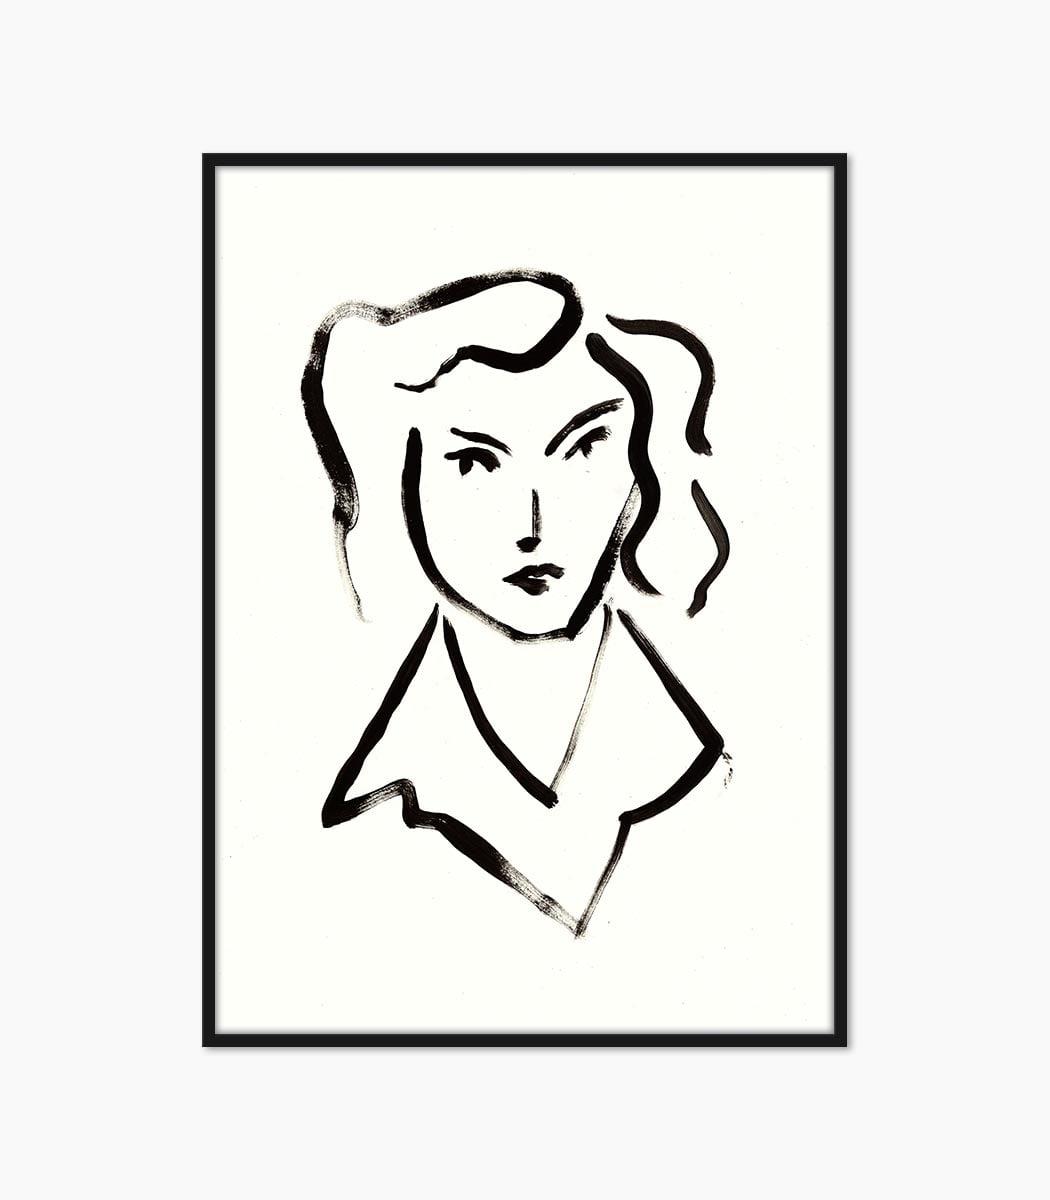 print pictura portret creata manual si printata la calitate superioara numai pe www.artwall.ro